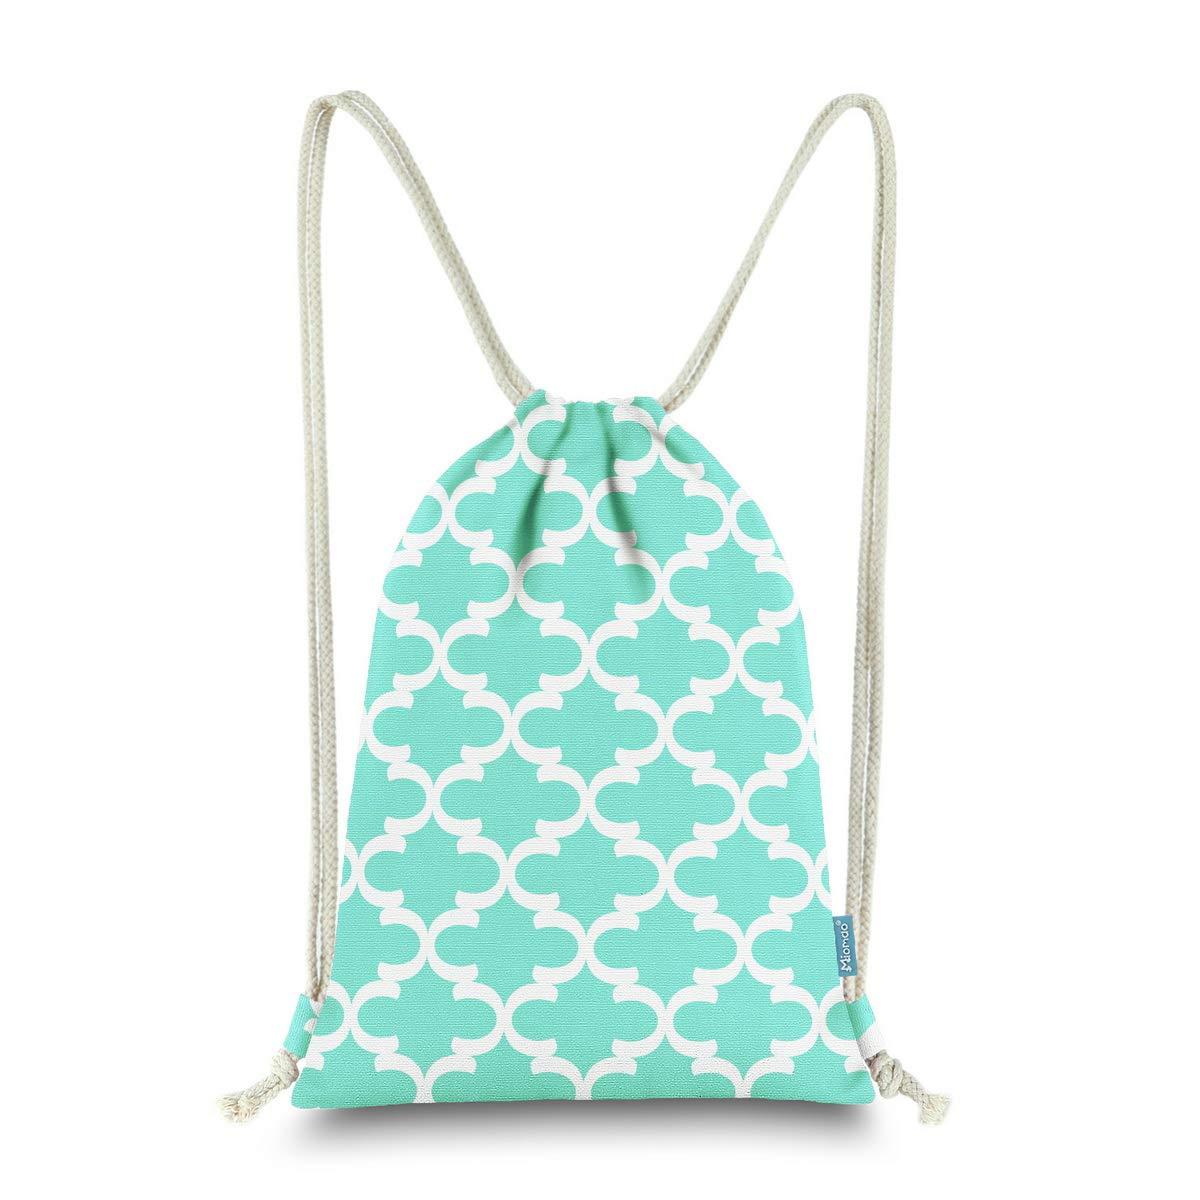 Miomao Drawstring Backpack Bag Quatrefoil Gym Sack Pack Geometric Sinch Sack Sport String Bag With Pocket Christams Gift Beach Bag 13 X 18 Inches Fair Aqua